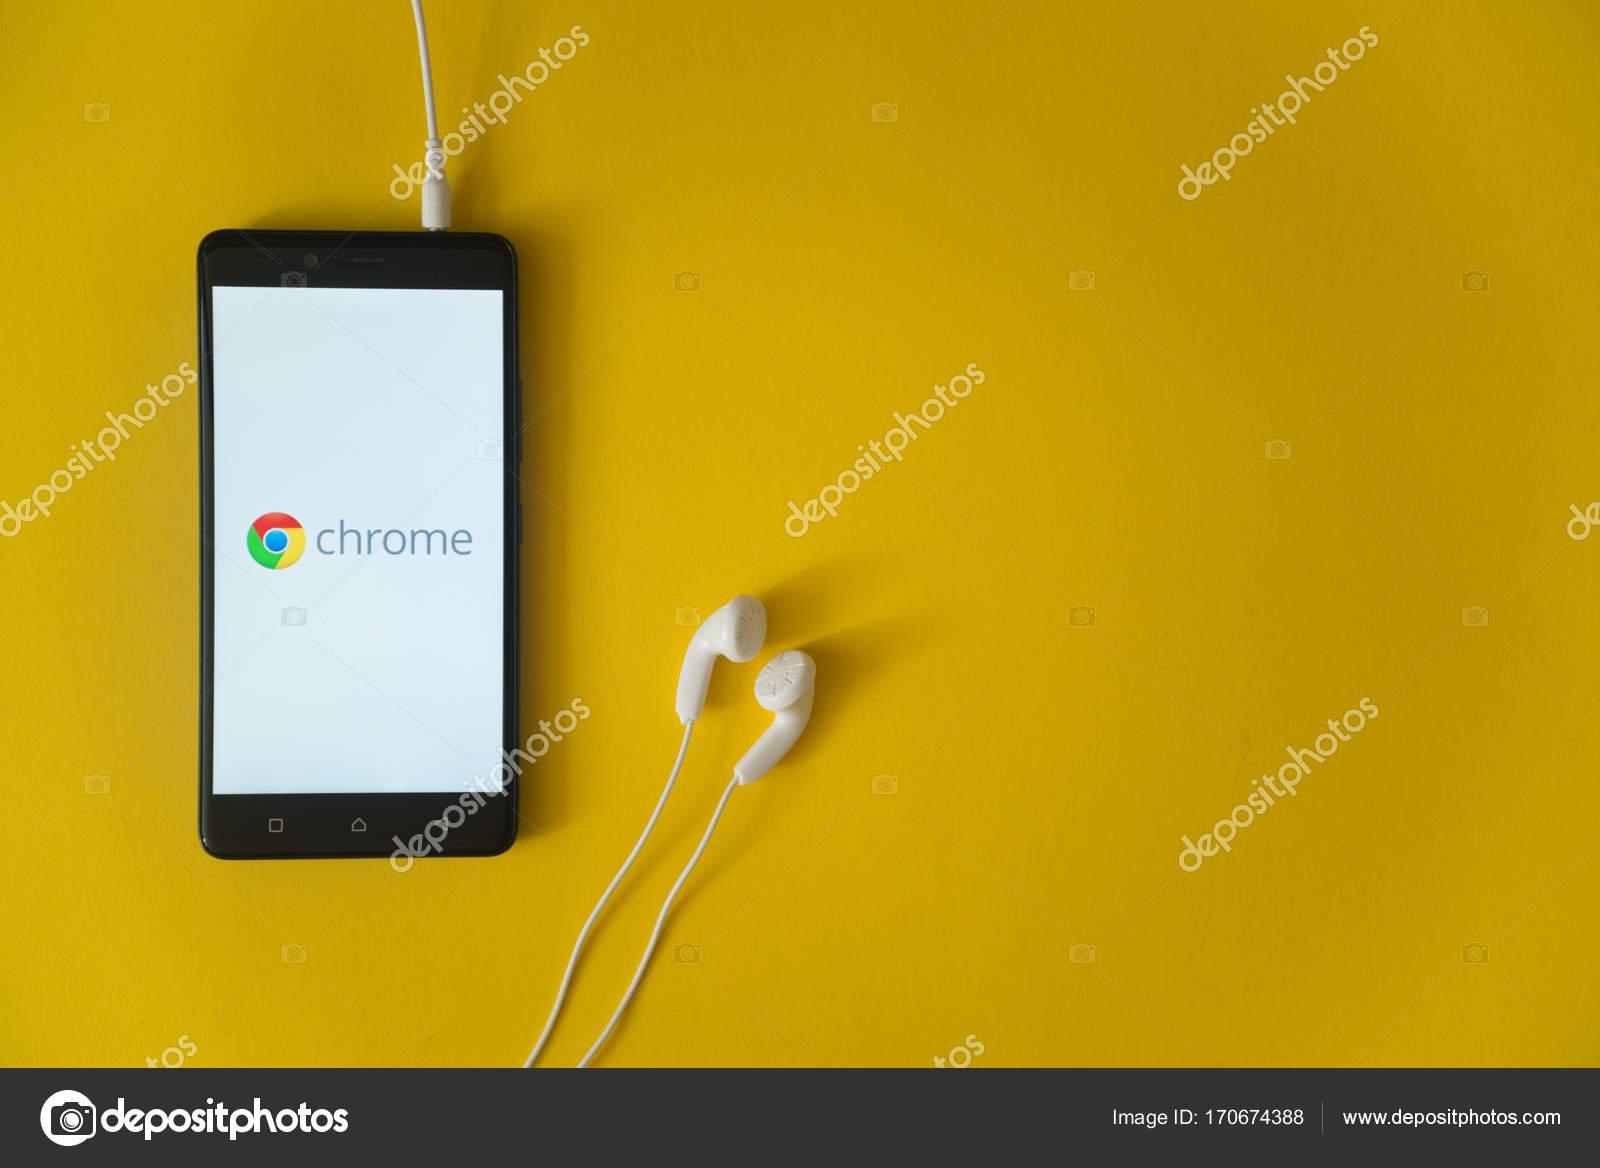 Google chrome logo on smartphone screen on yellow background